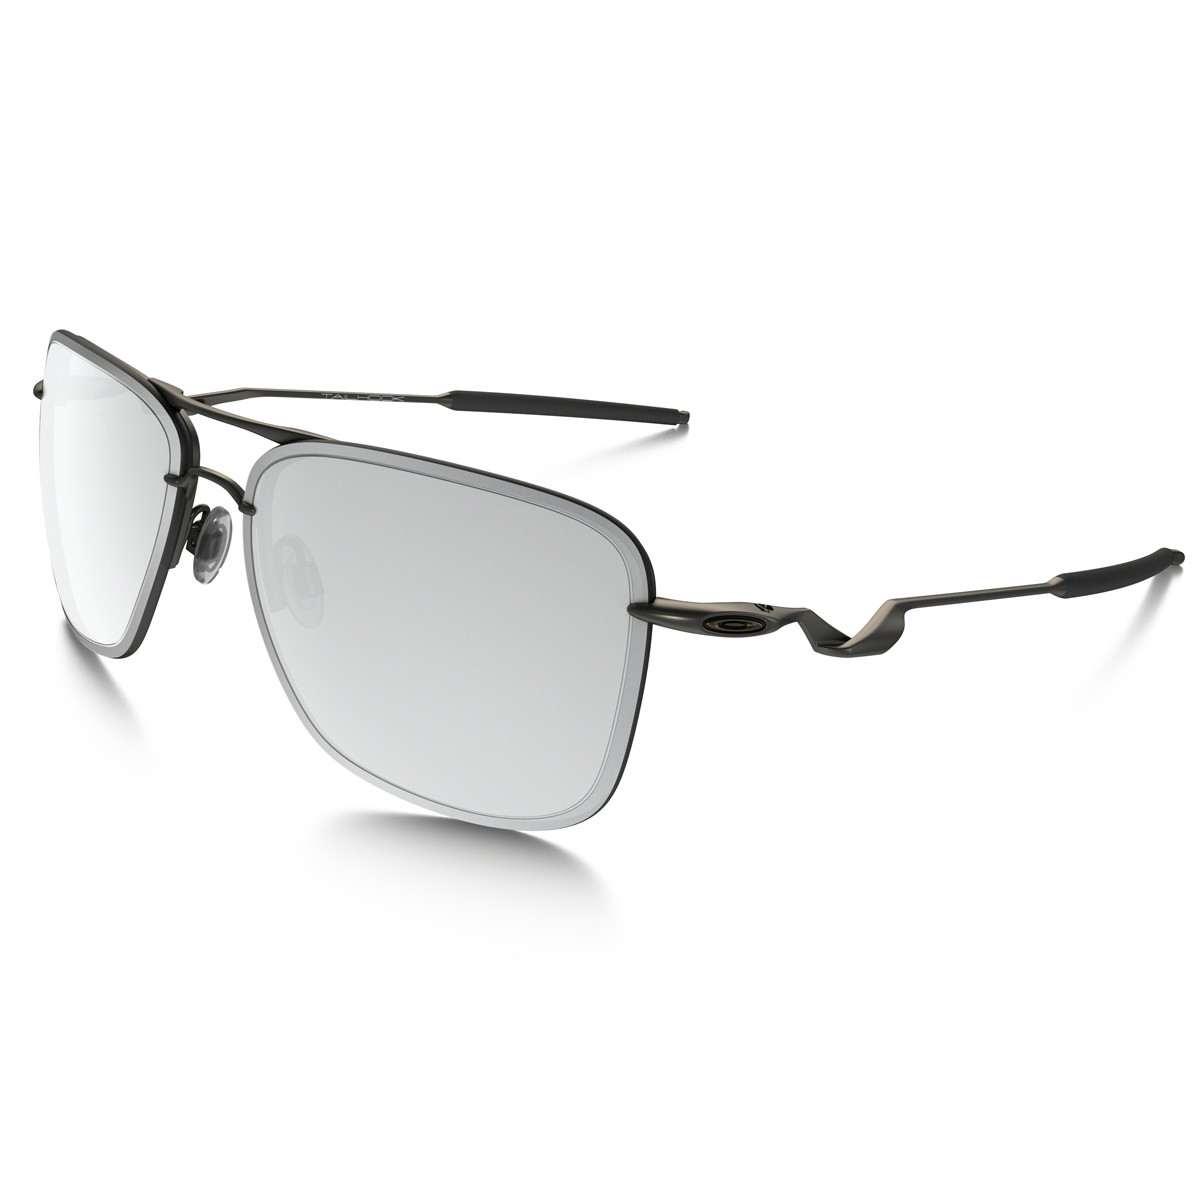 28e36ac9cb067 Óculos Oakley Tailhook Carbon Lente Chrome Iridium ref OO4087-02